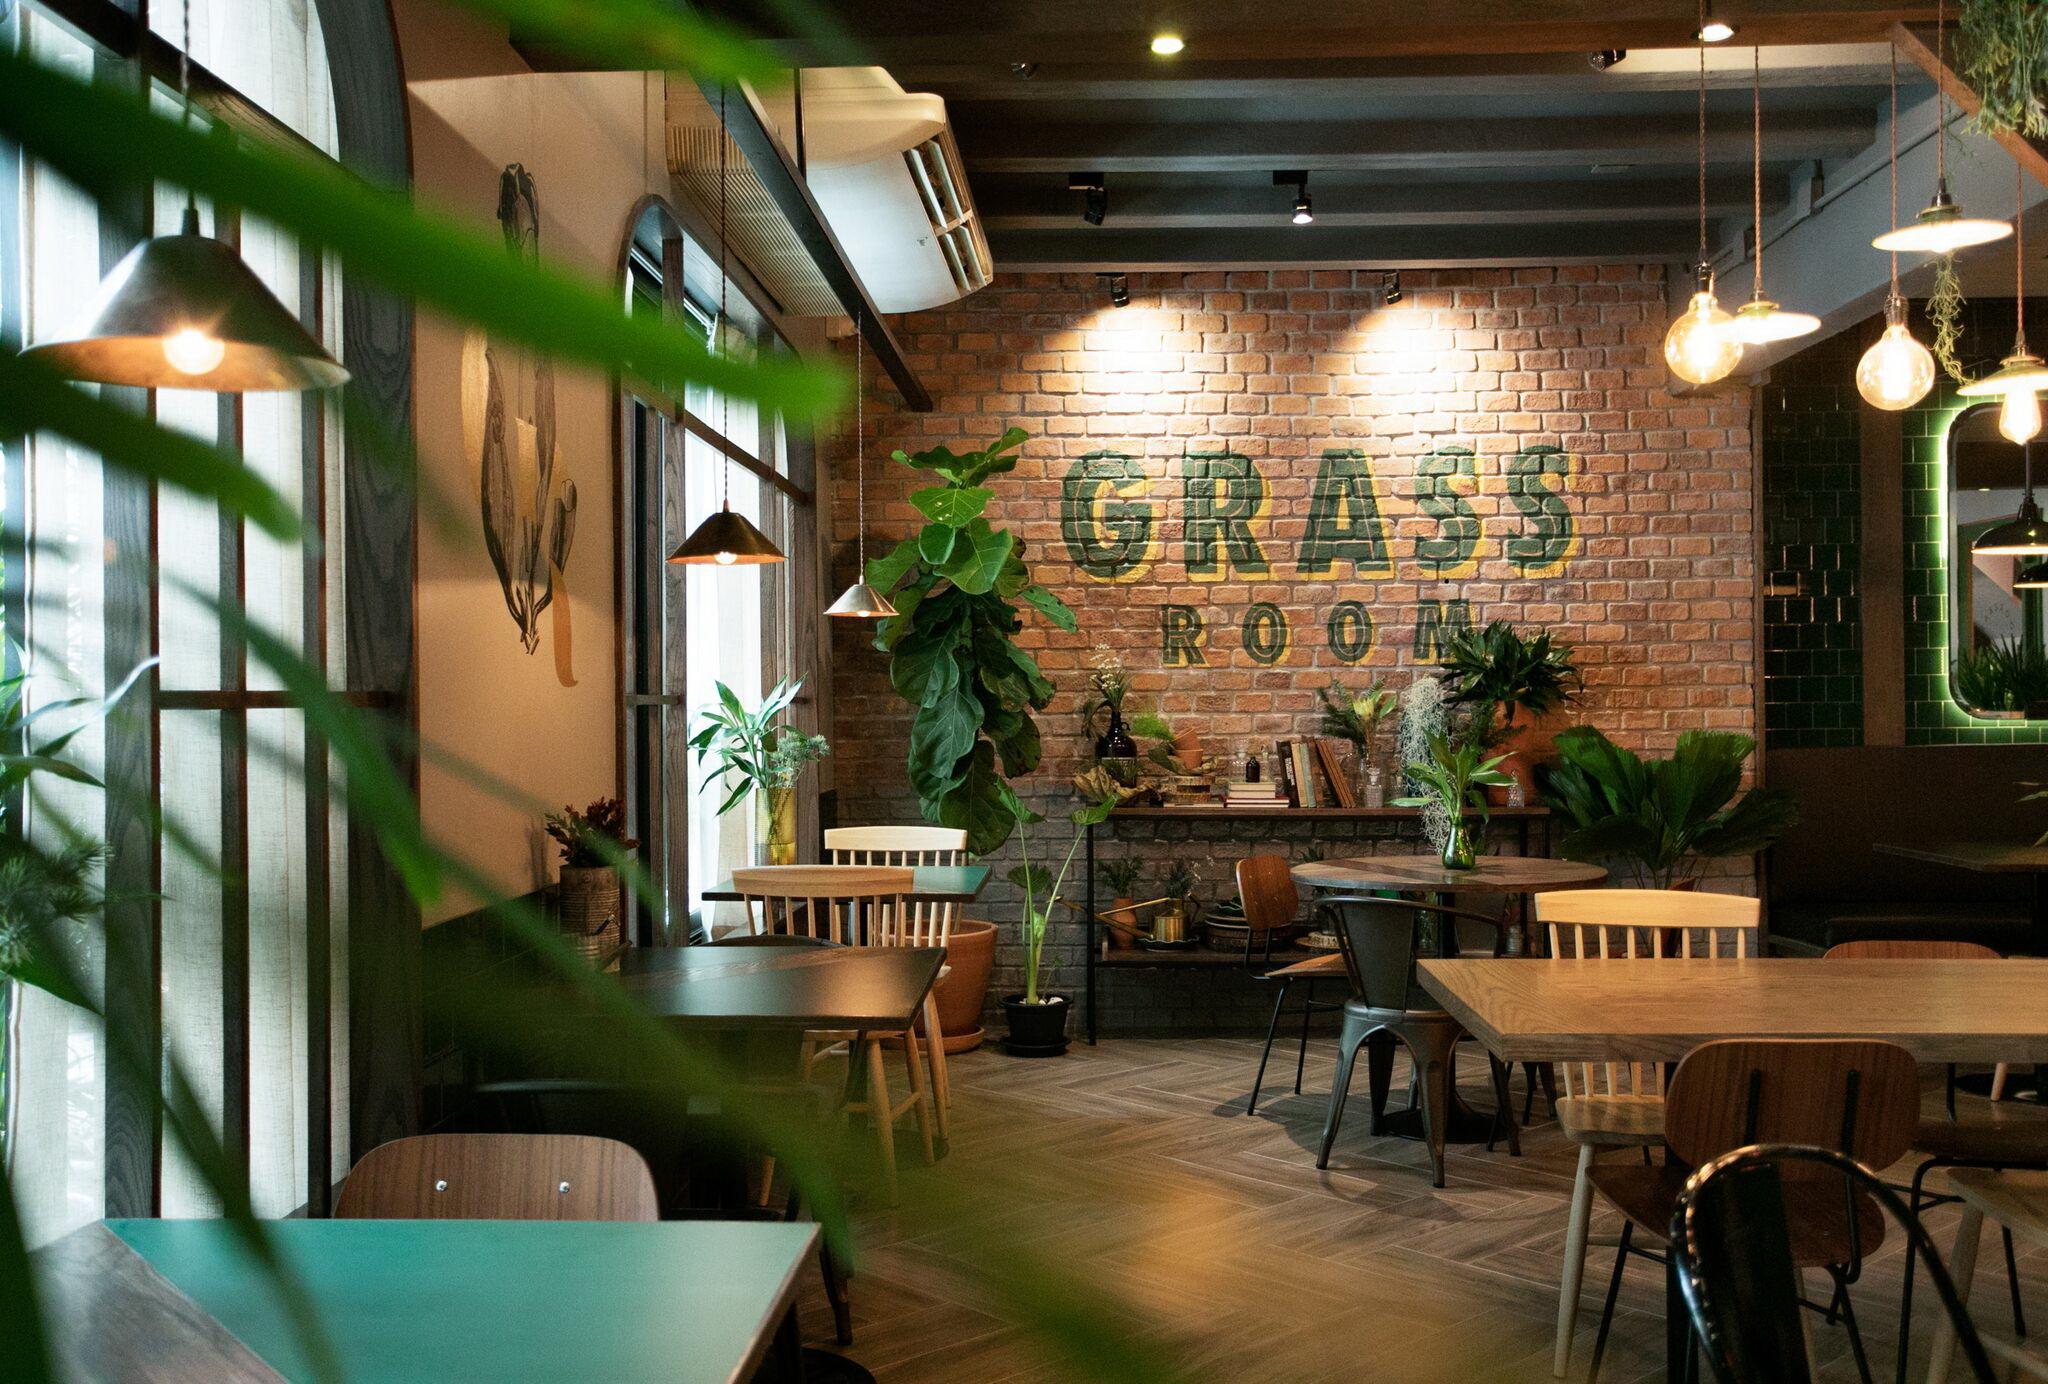 Grassroom Bangkok